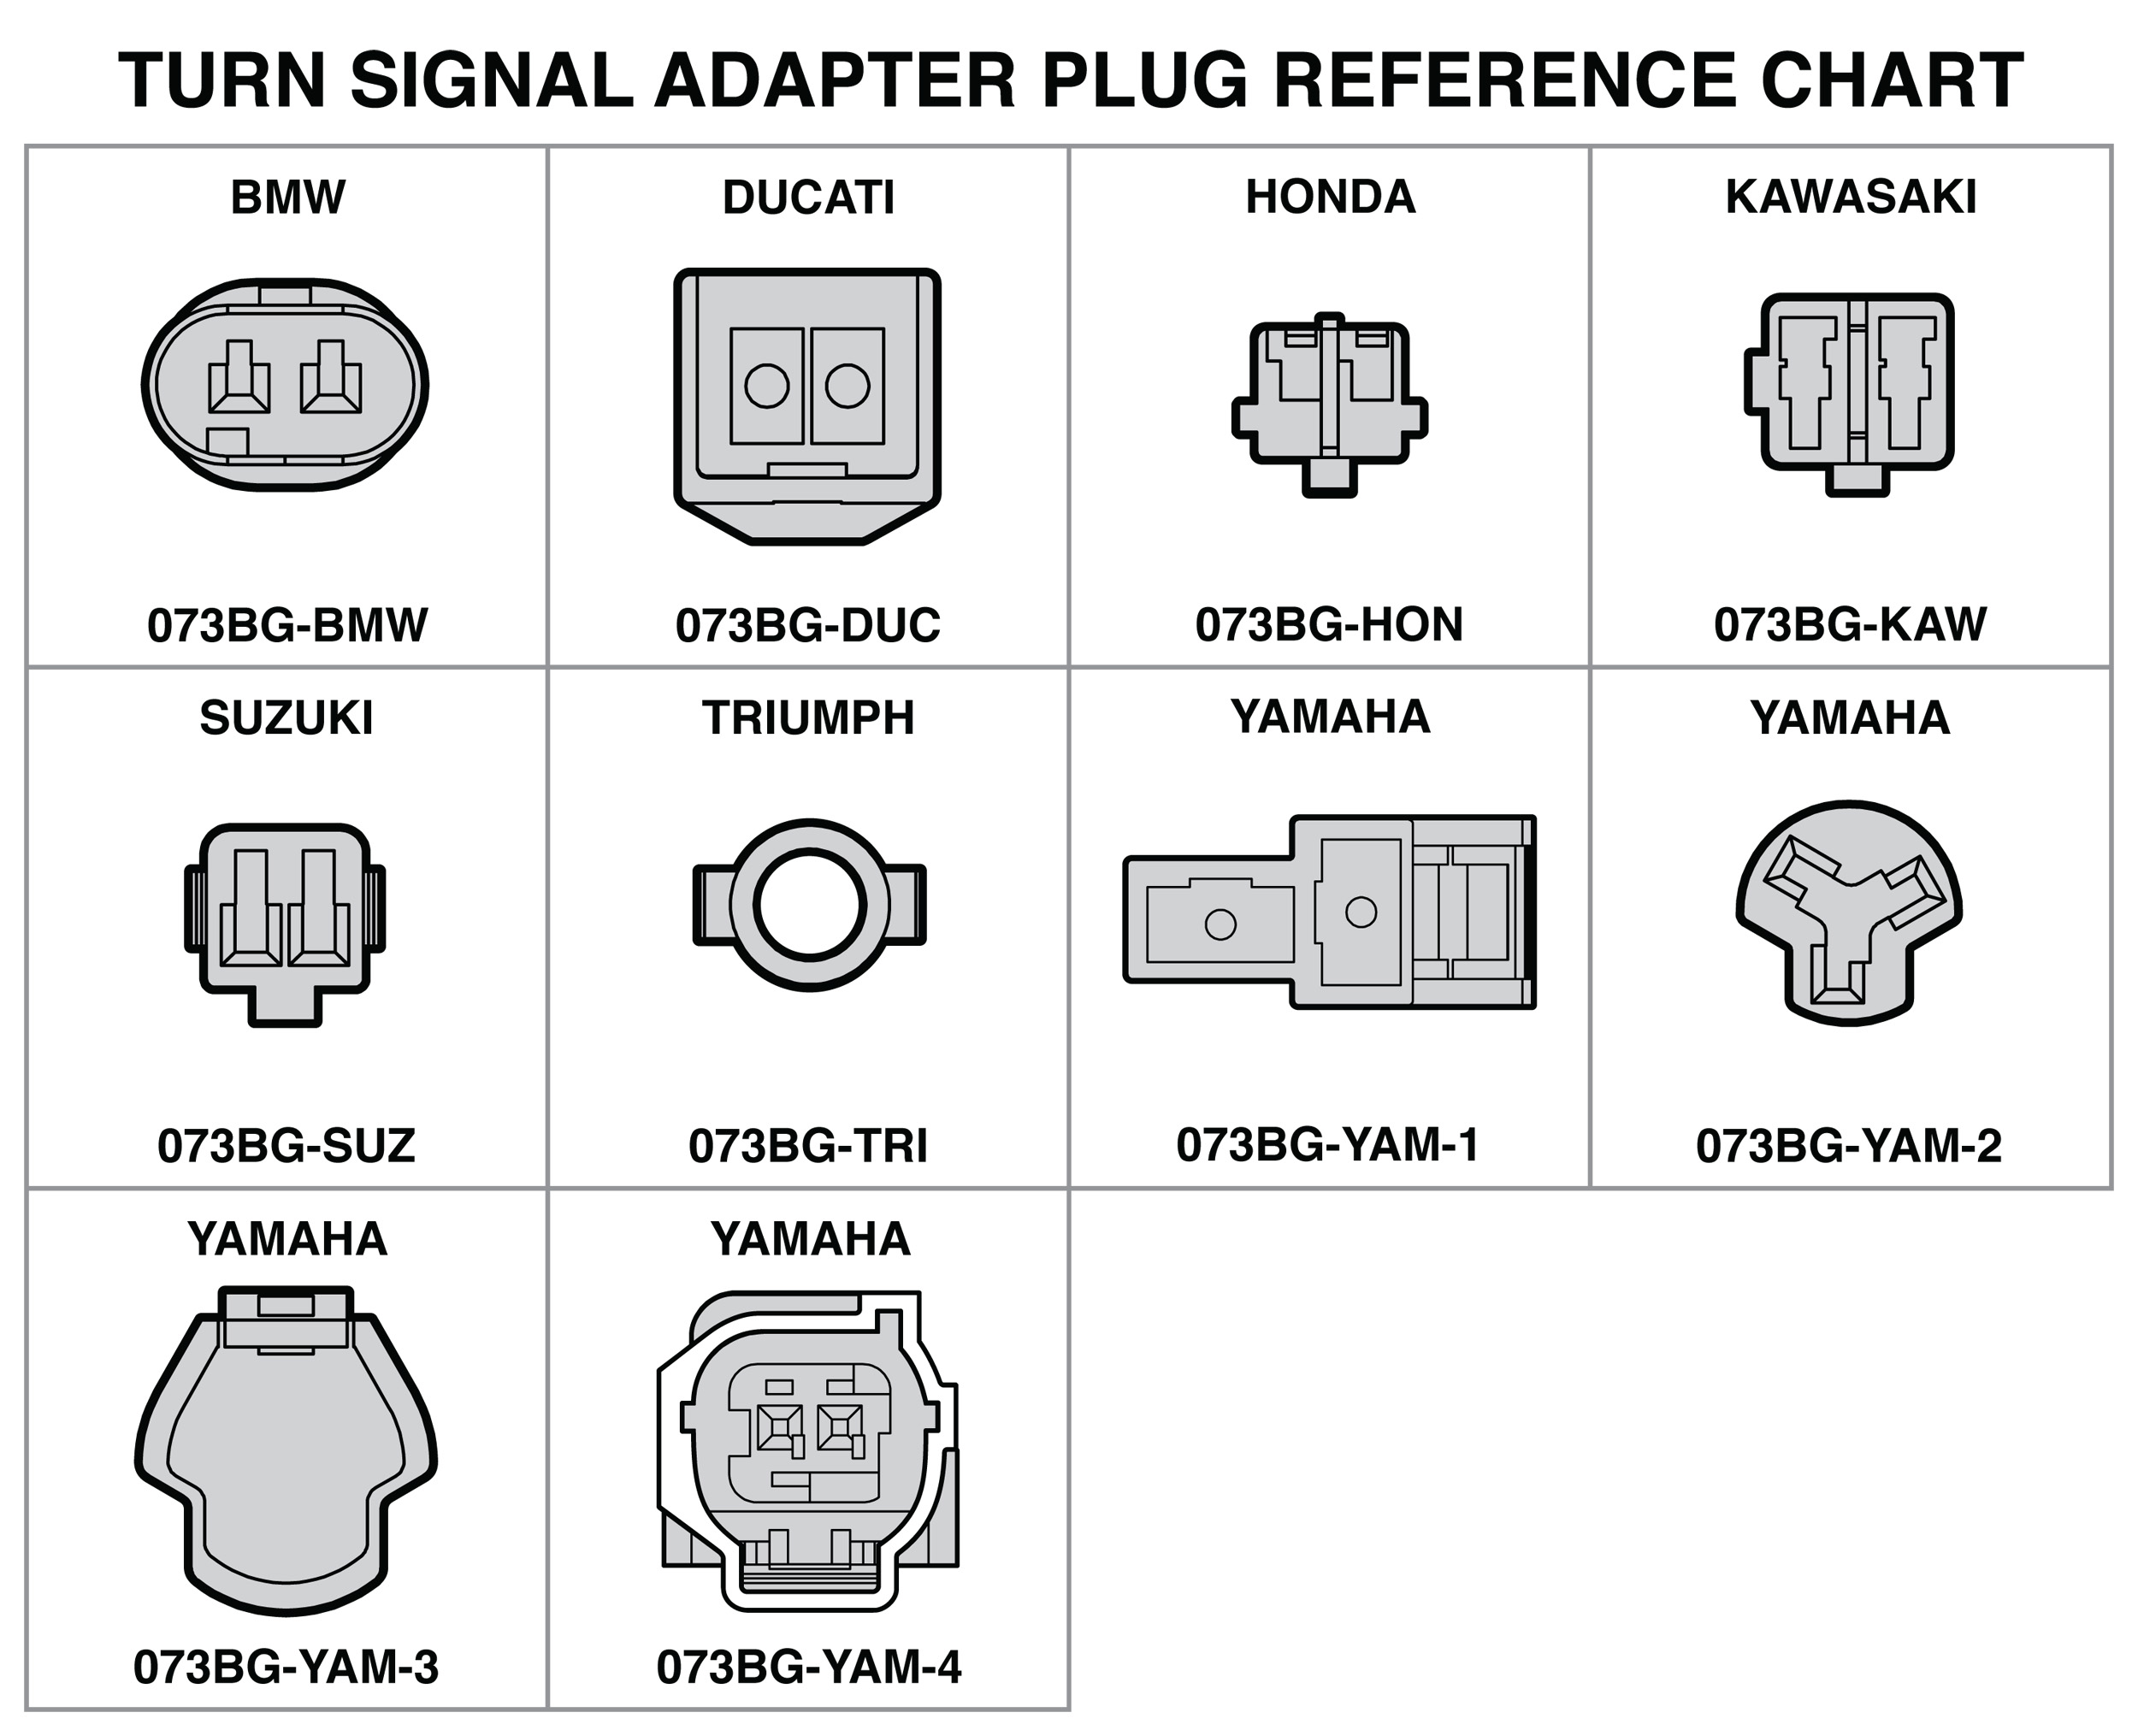 Turn Signal Adaptor Plug Reference Chart